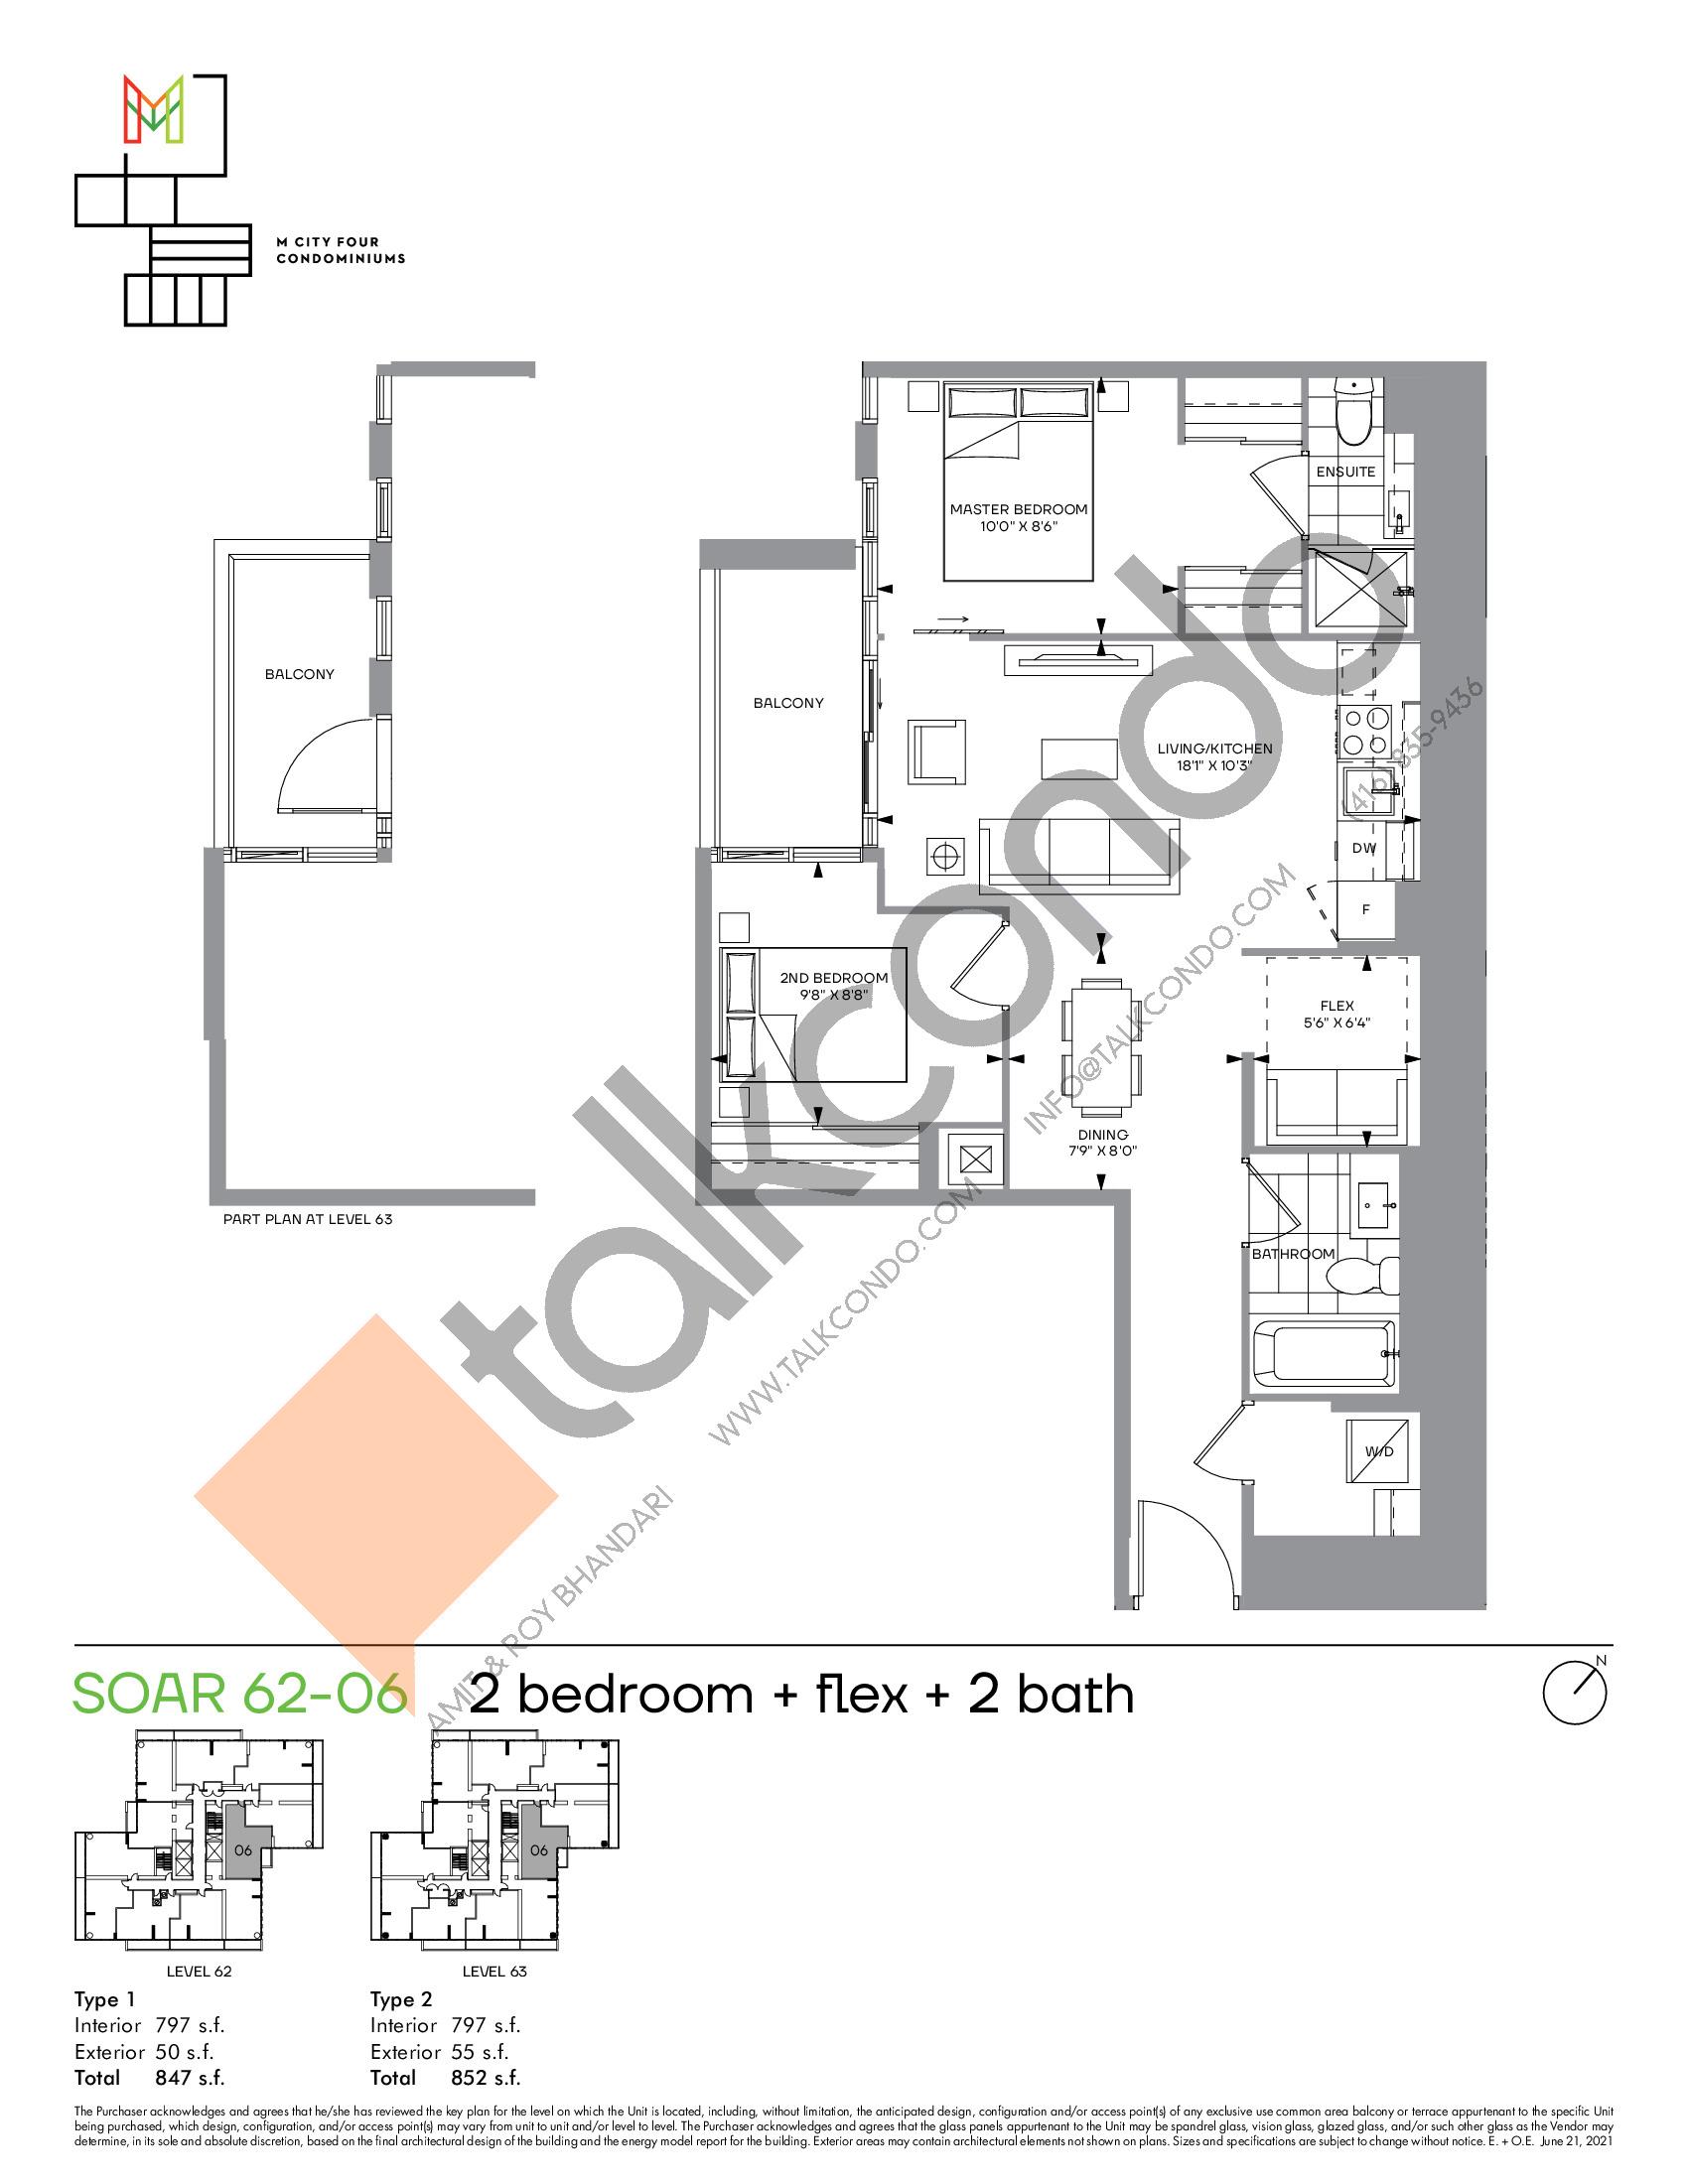 Soar 62-06 Floor Plan at M4 Condos - 797 sq.ft